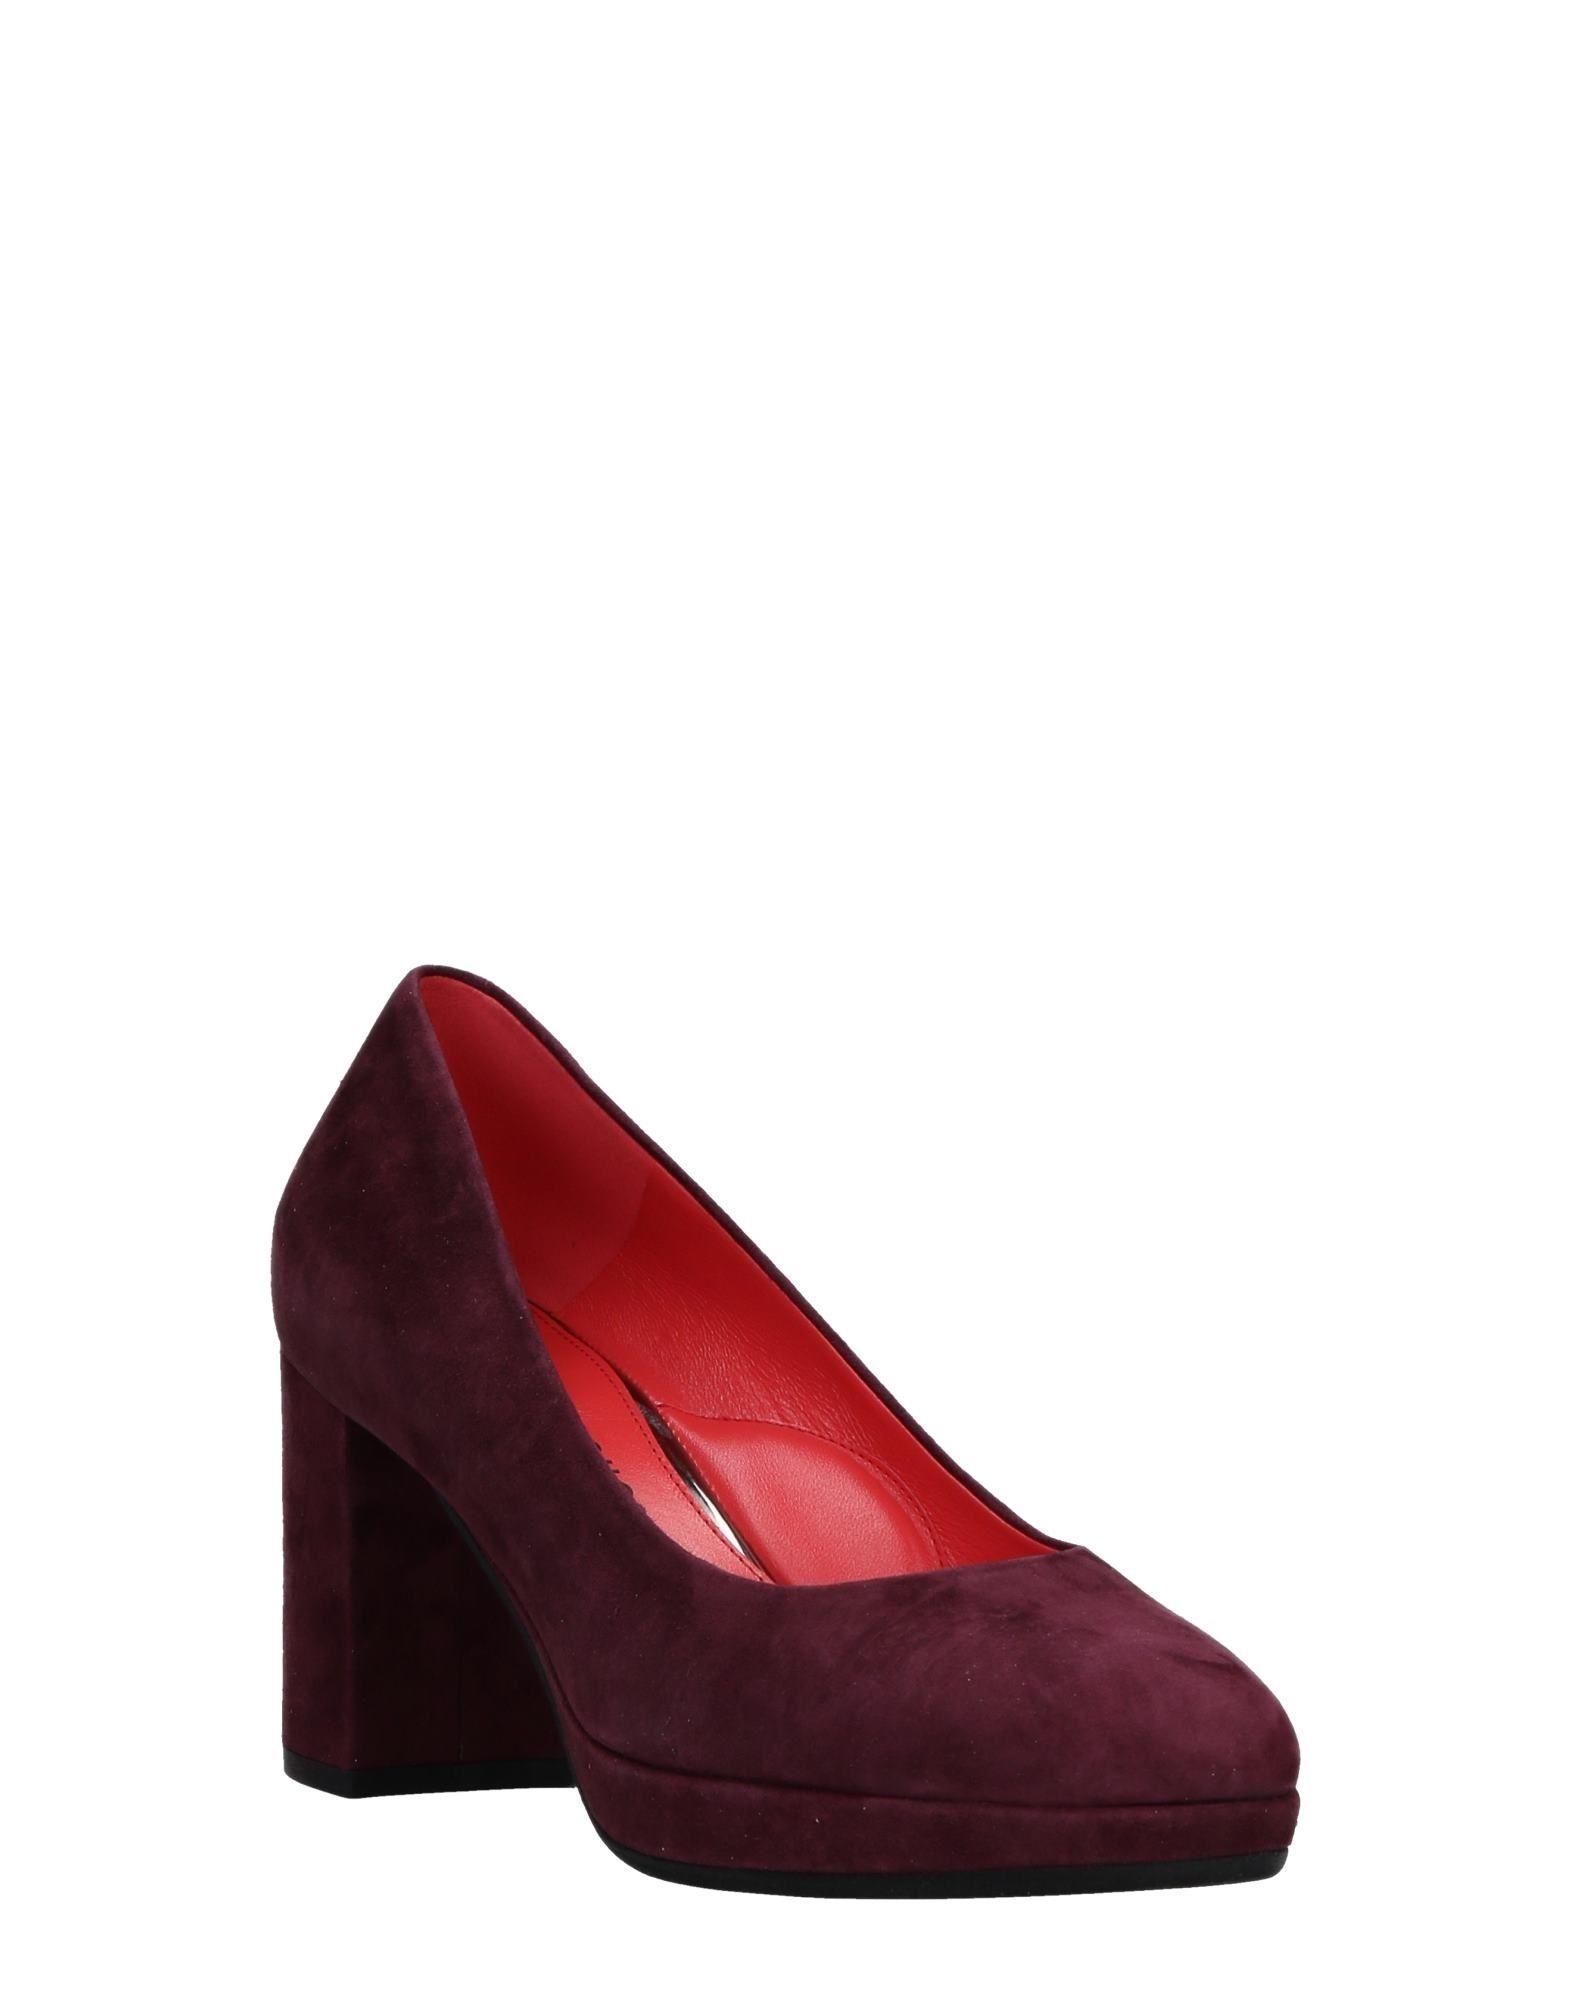 Stilvolle billige Pumps Schuhe Pas De Rouge Pumps billige Damen  11512799KF 100163